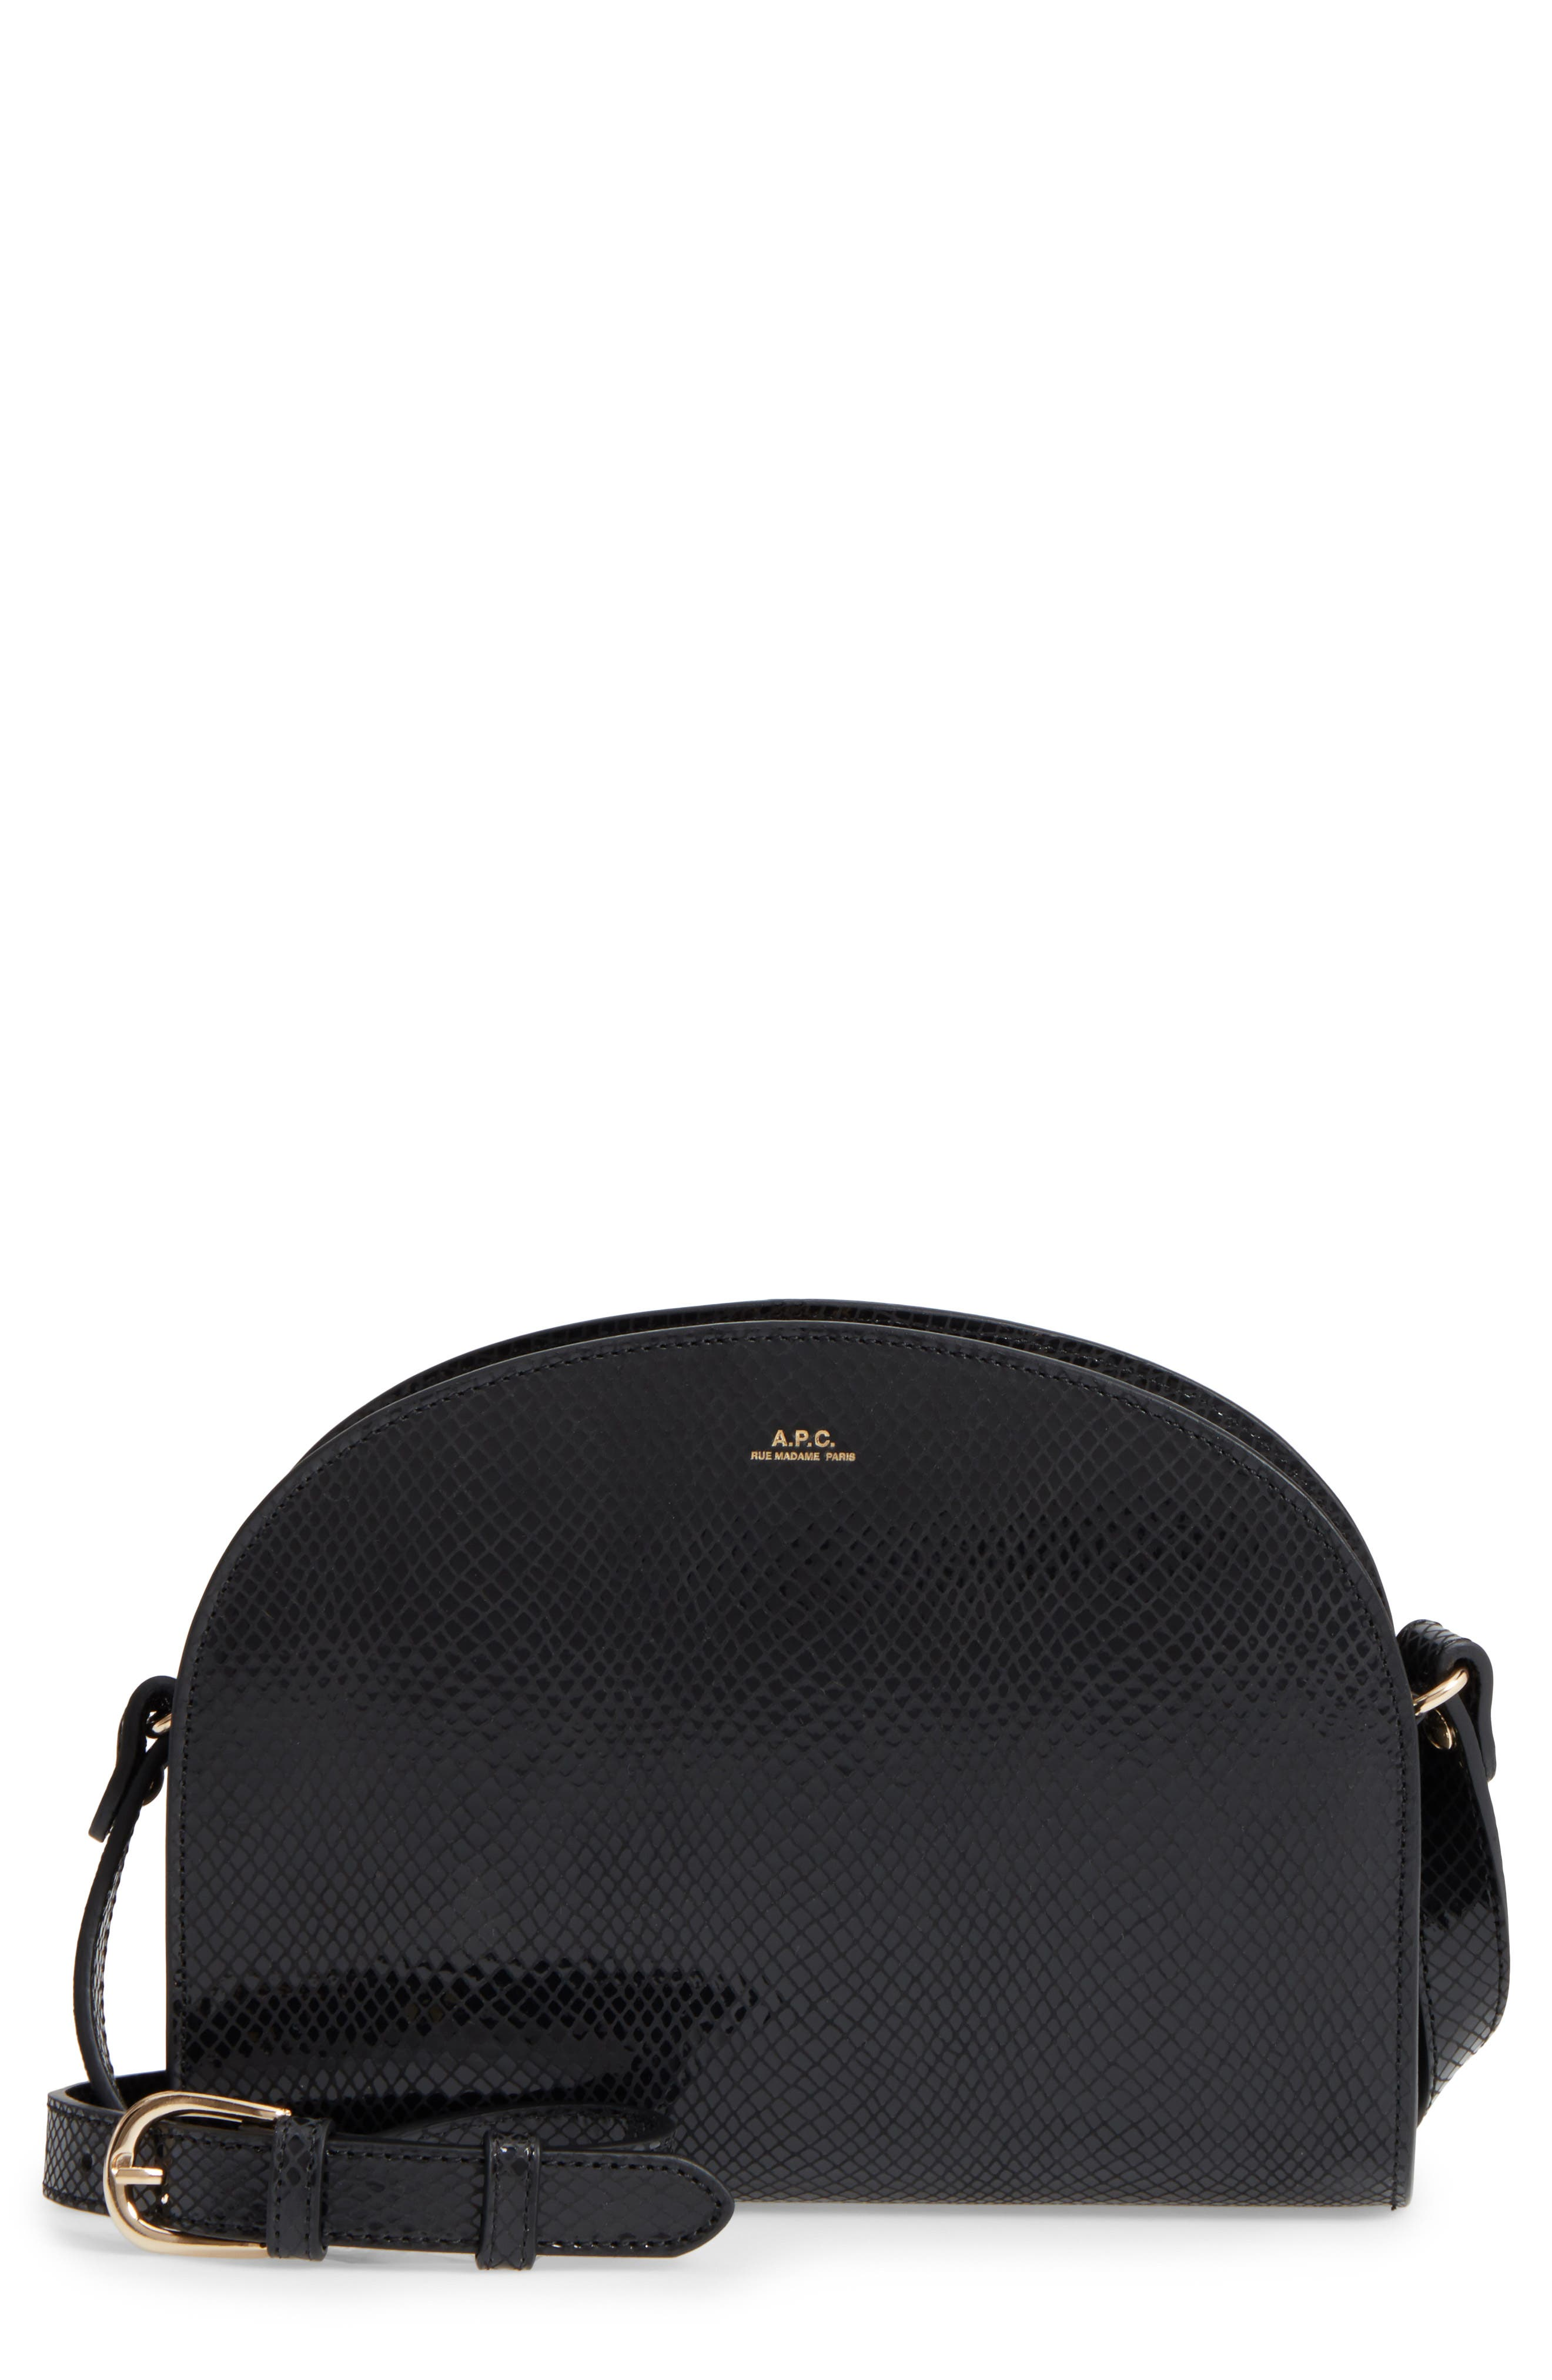 Sale alerts for  Half Moon Leather Crossbody Bag - Covvet